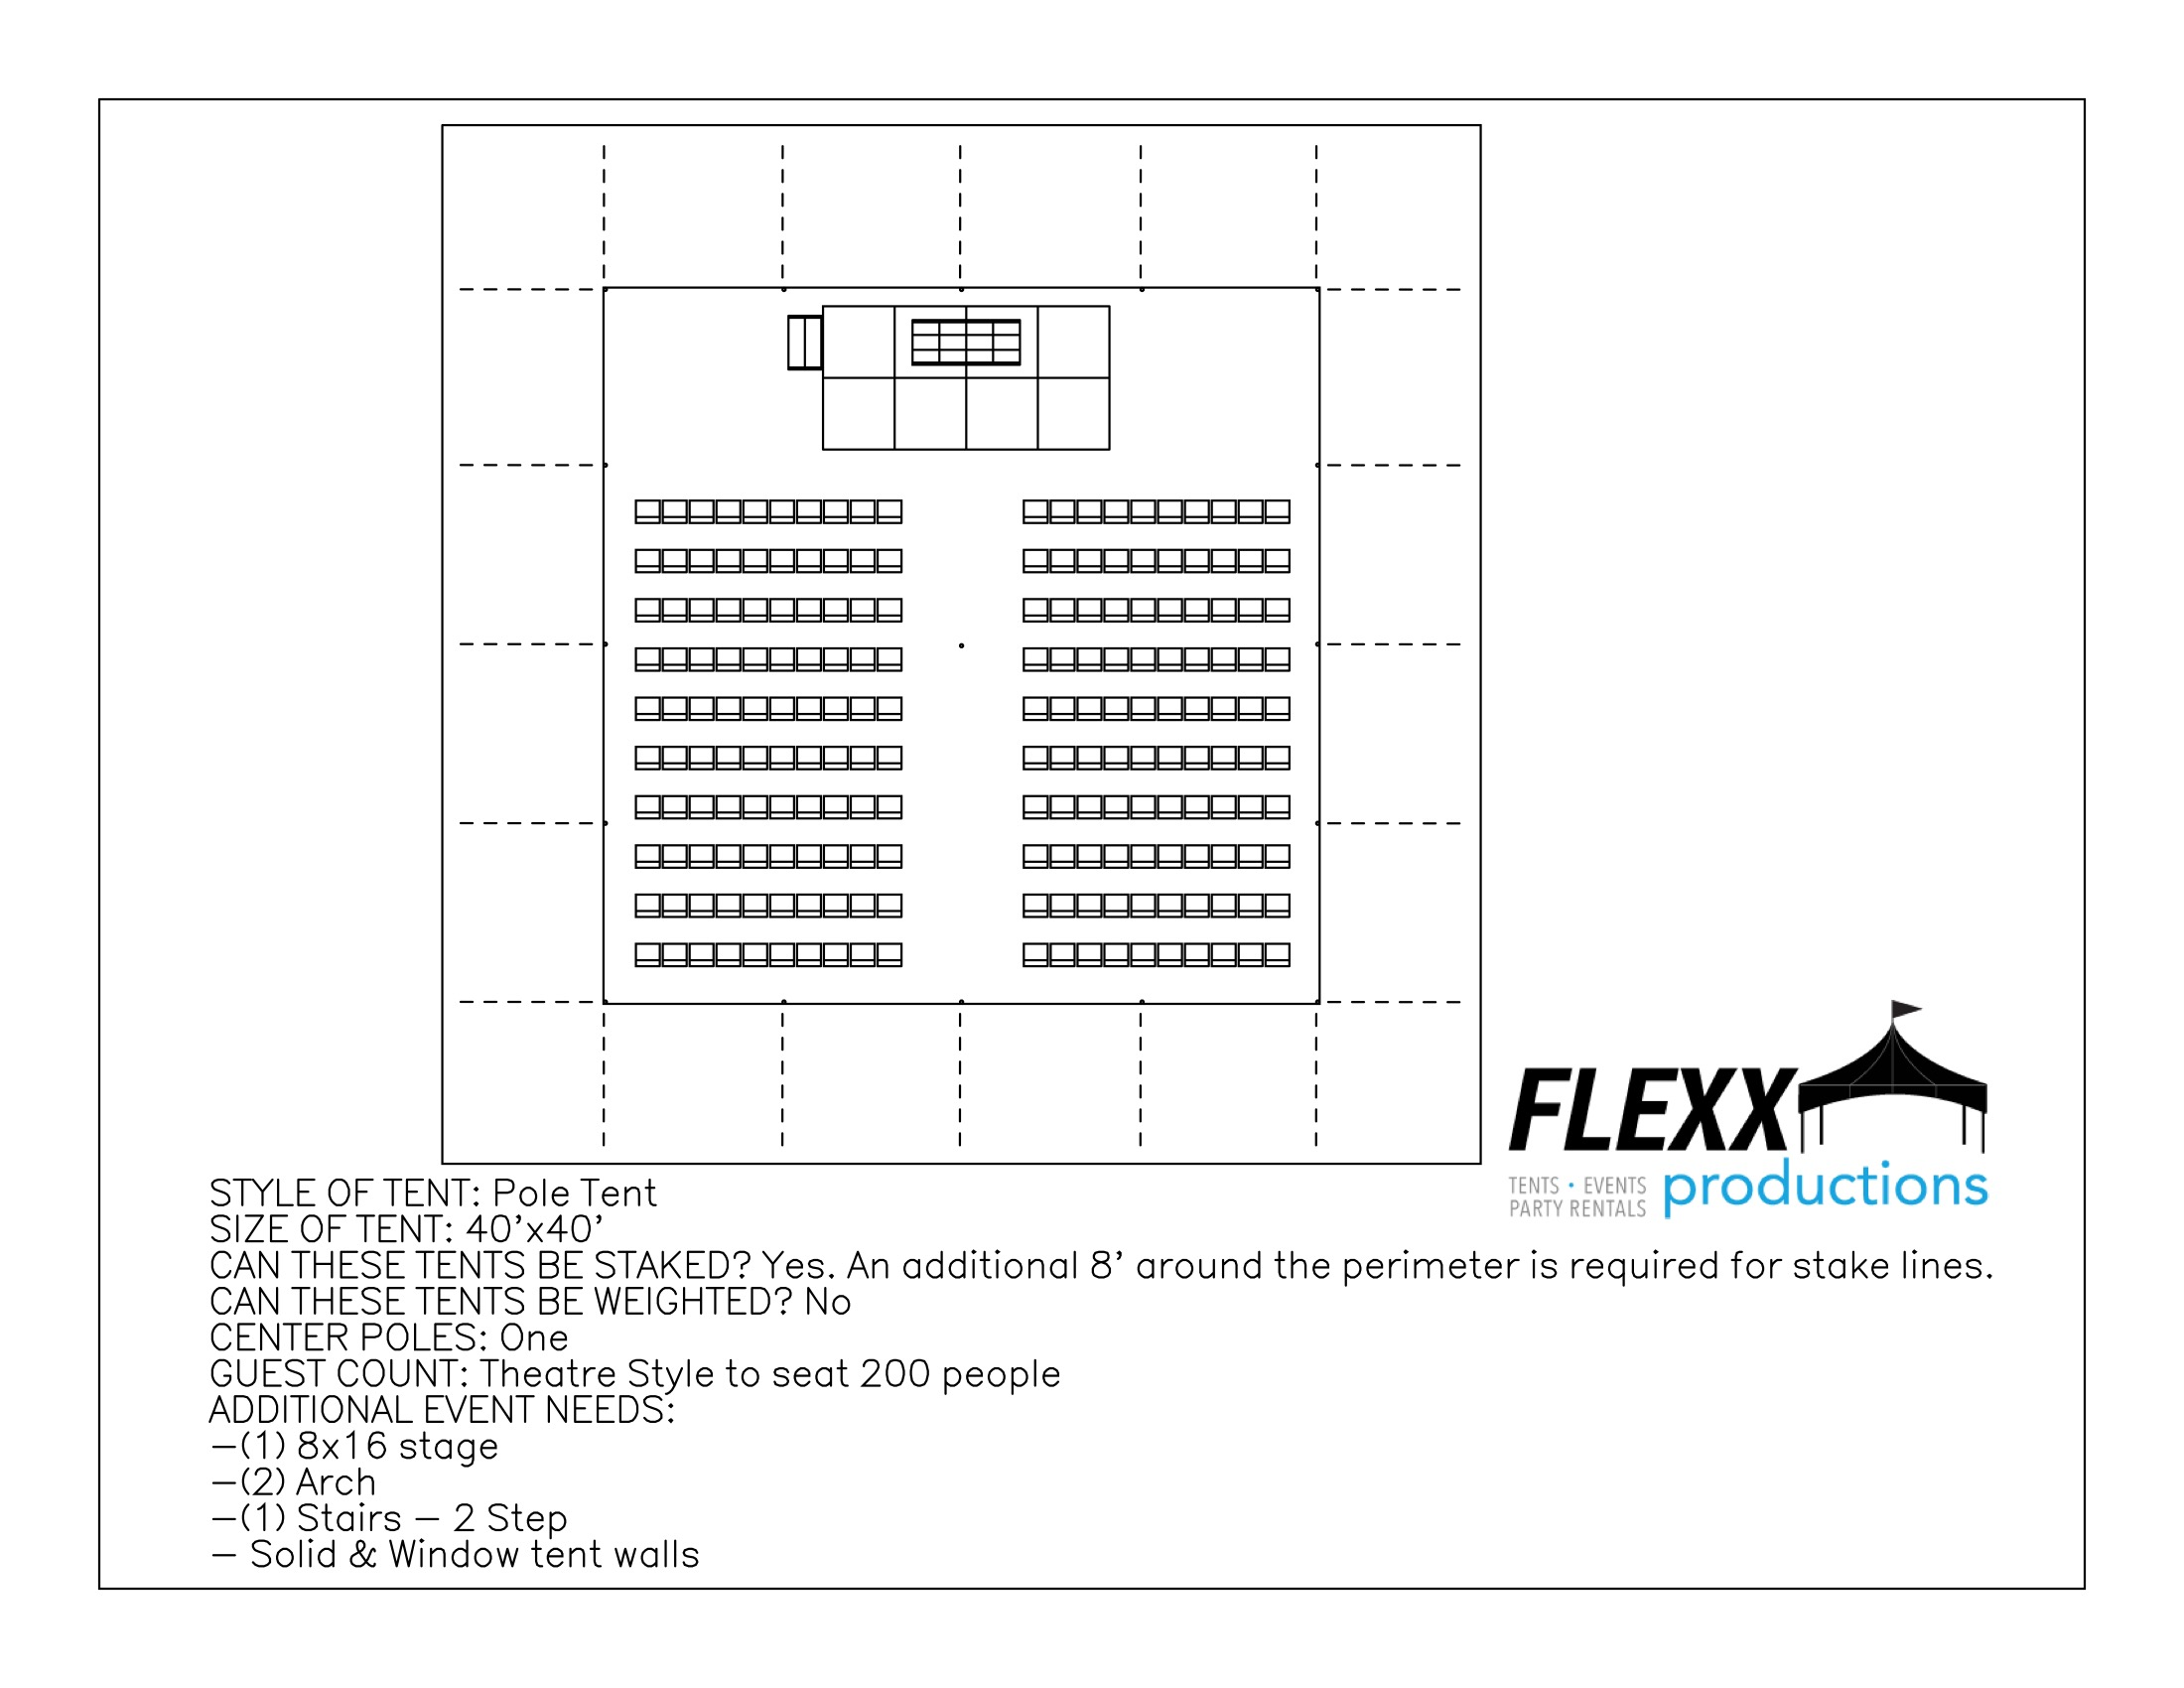 Flexx Productions Pole Tent Layout -  sc 1 st  FLEXX Productions & 40x pole tent layout - FLEXX Productions